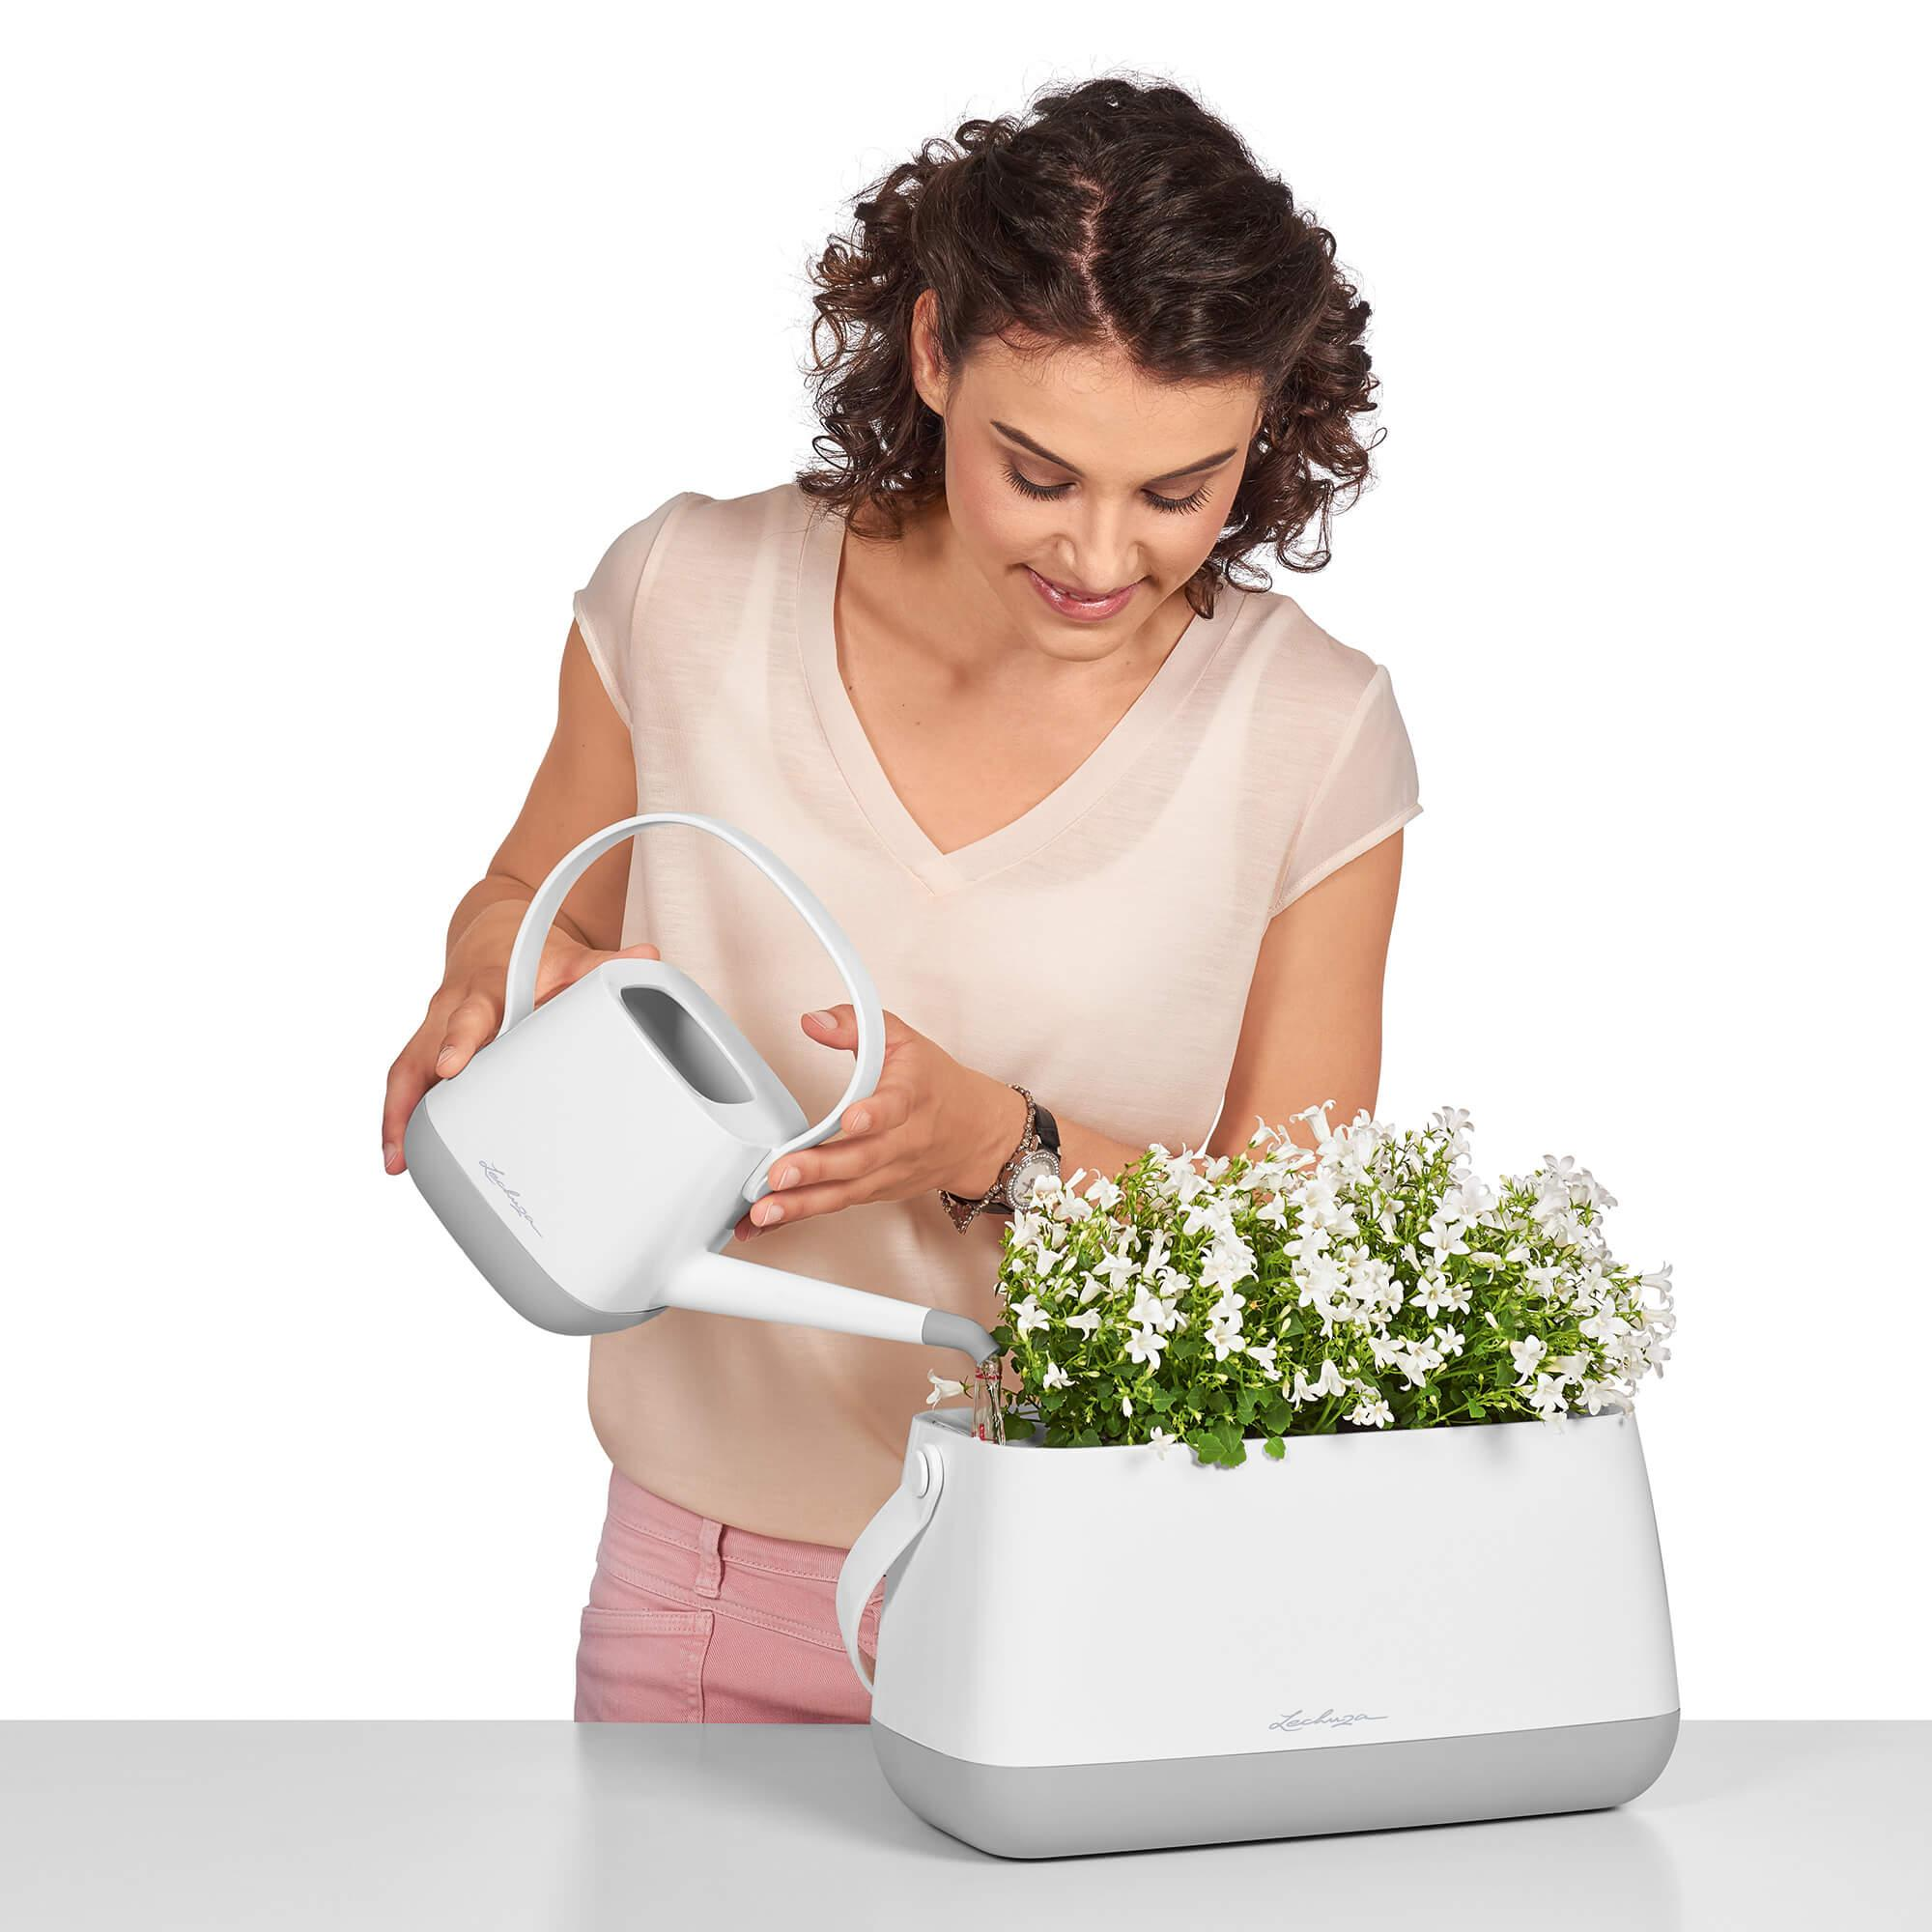 YULA plant bag white/gray semi-gloss - Image 11